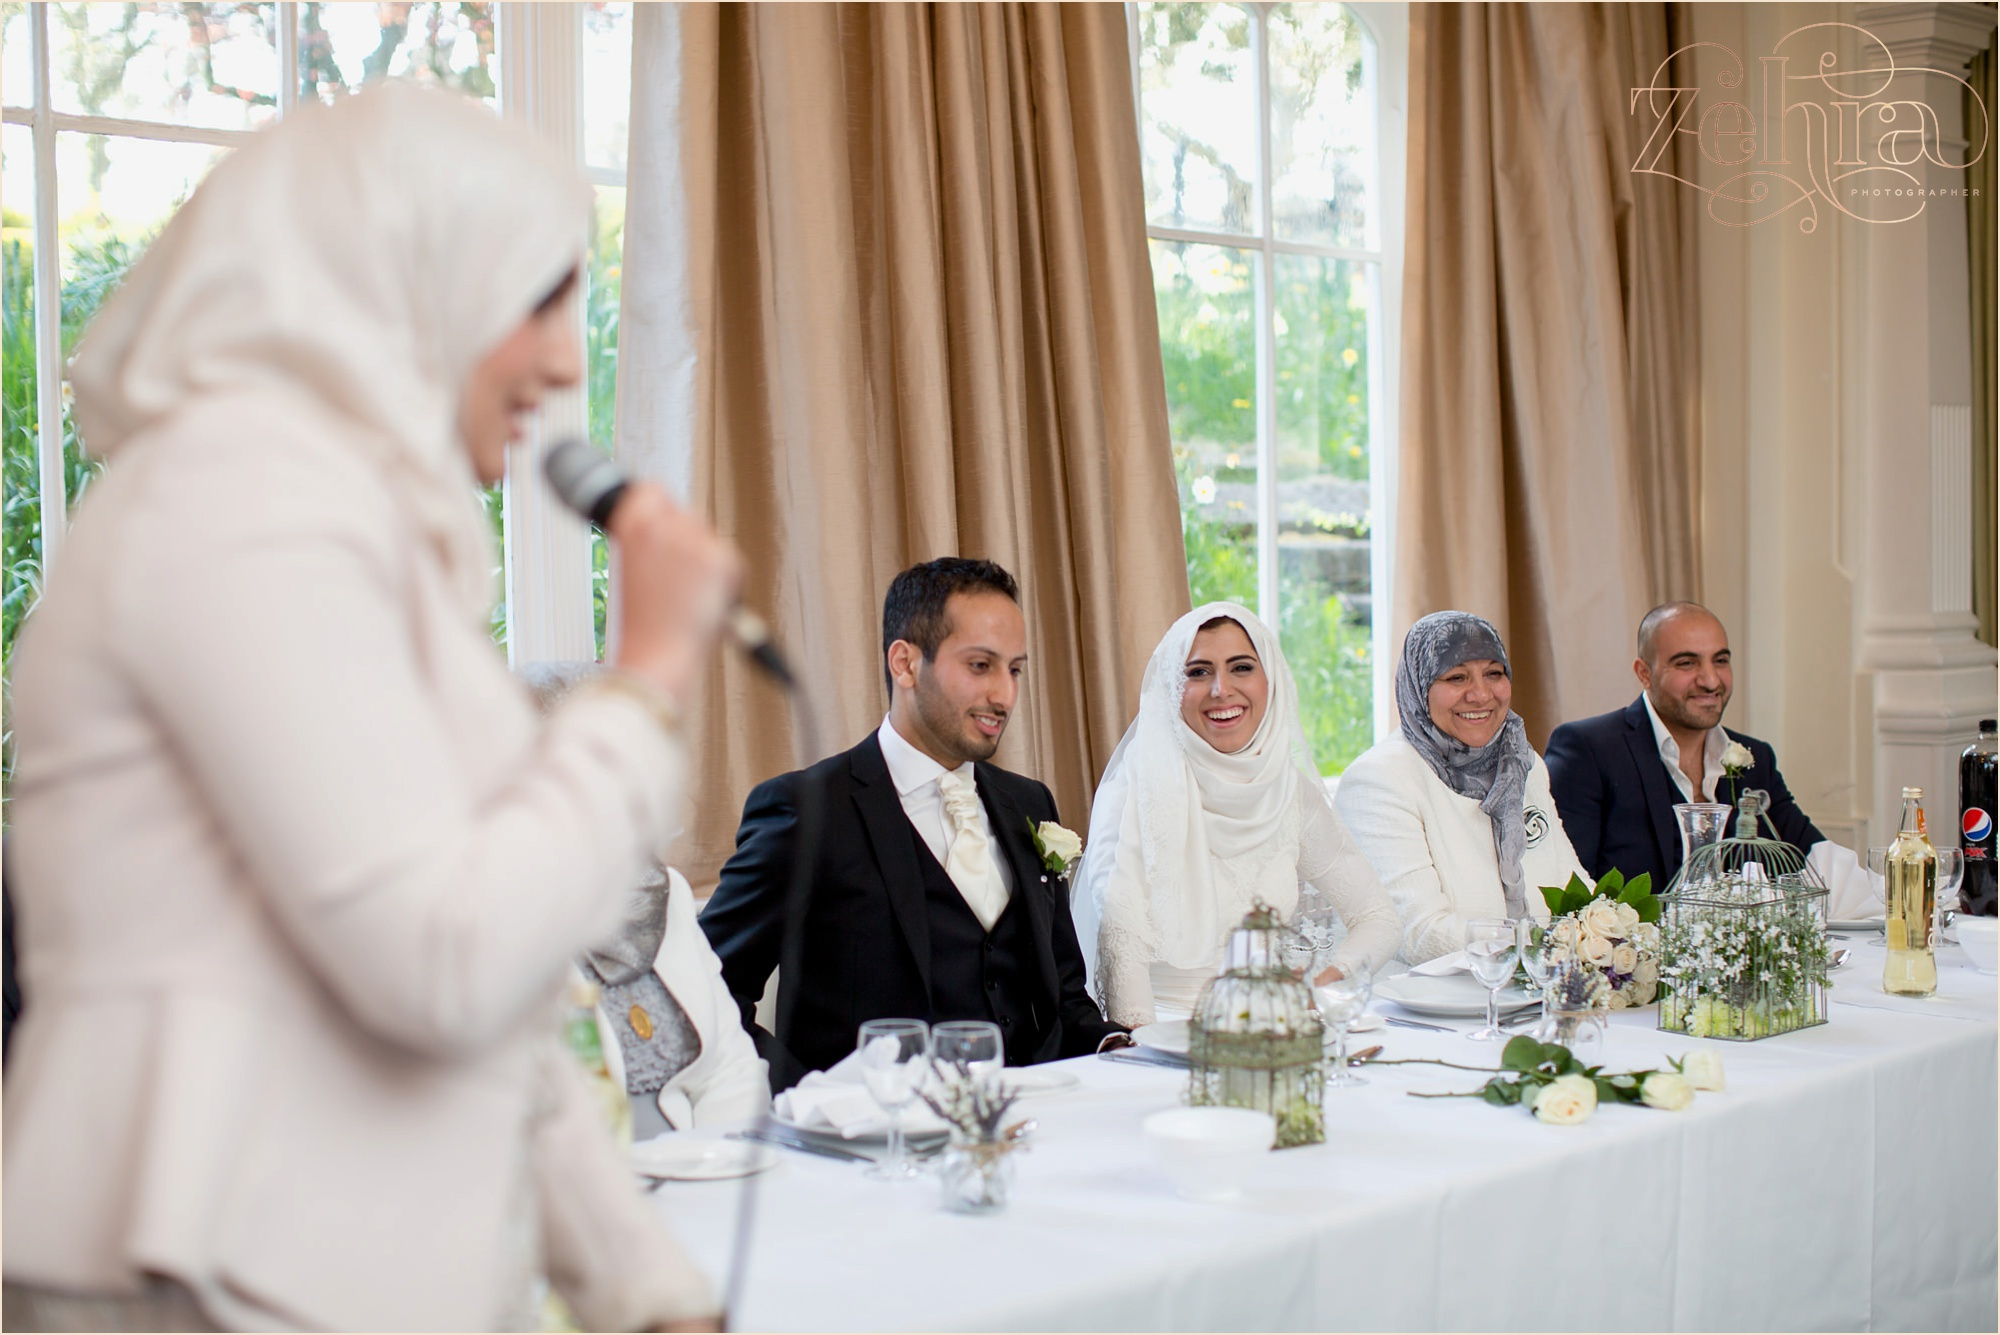 jasira manchester wedding photographer_0095.jpg